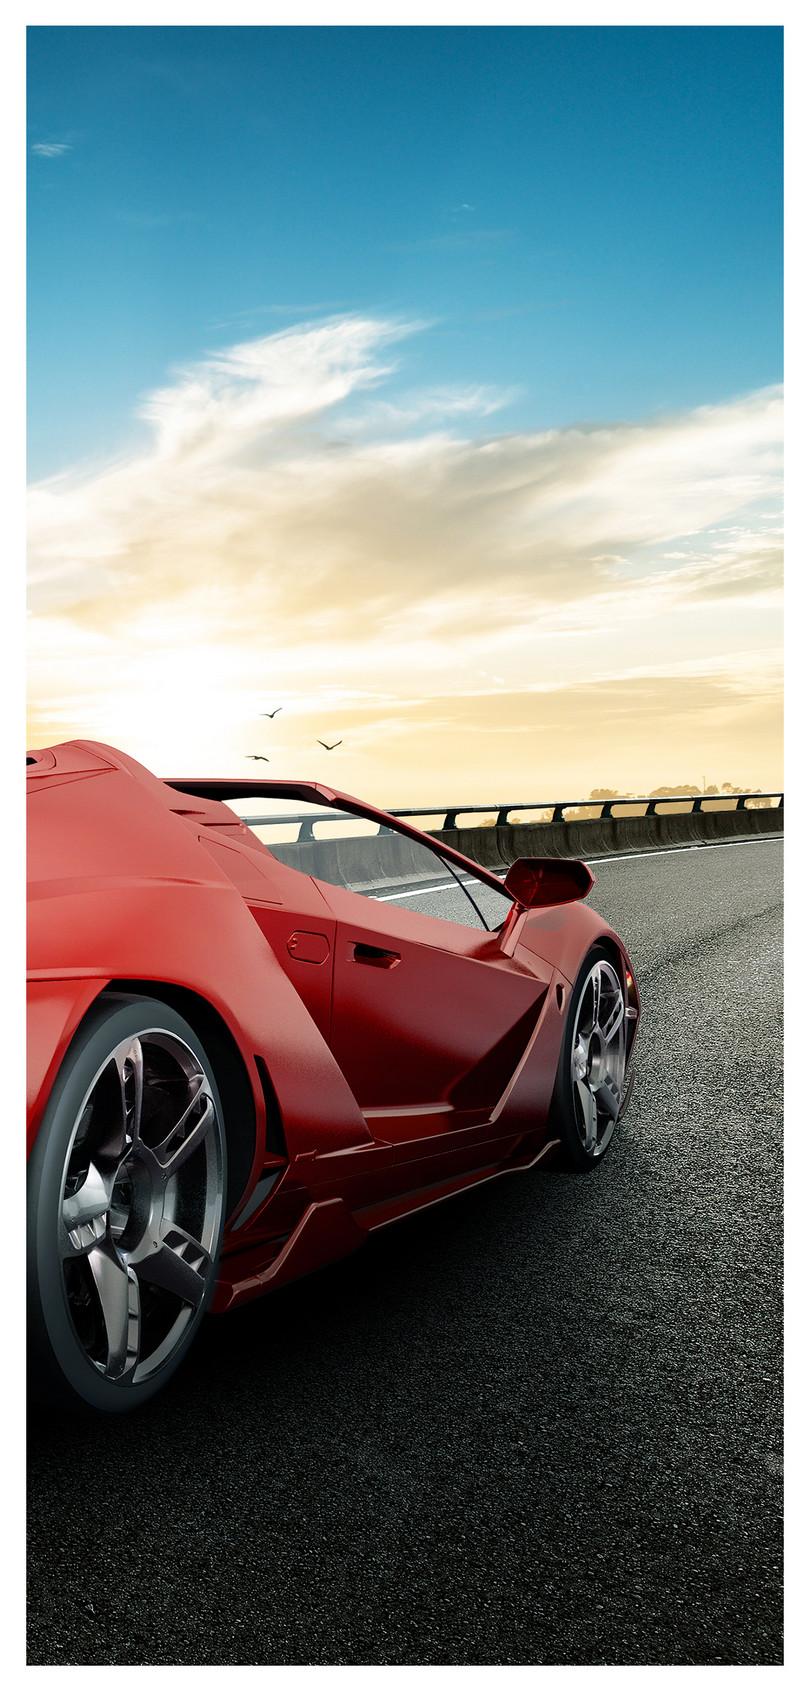 Wallpaper Telepon Mobil Sport - Carros Esportivos Papel De Parede , HD Wallpaper & Backgrounds